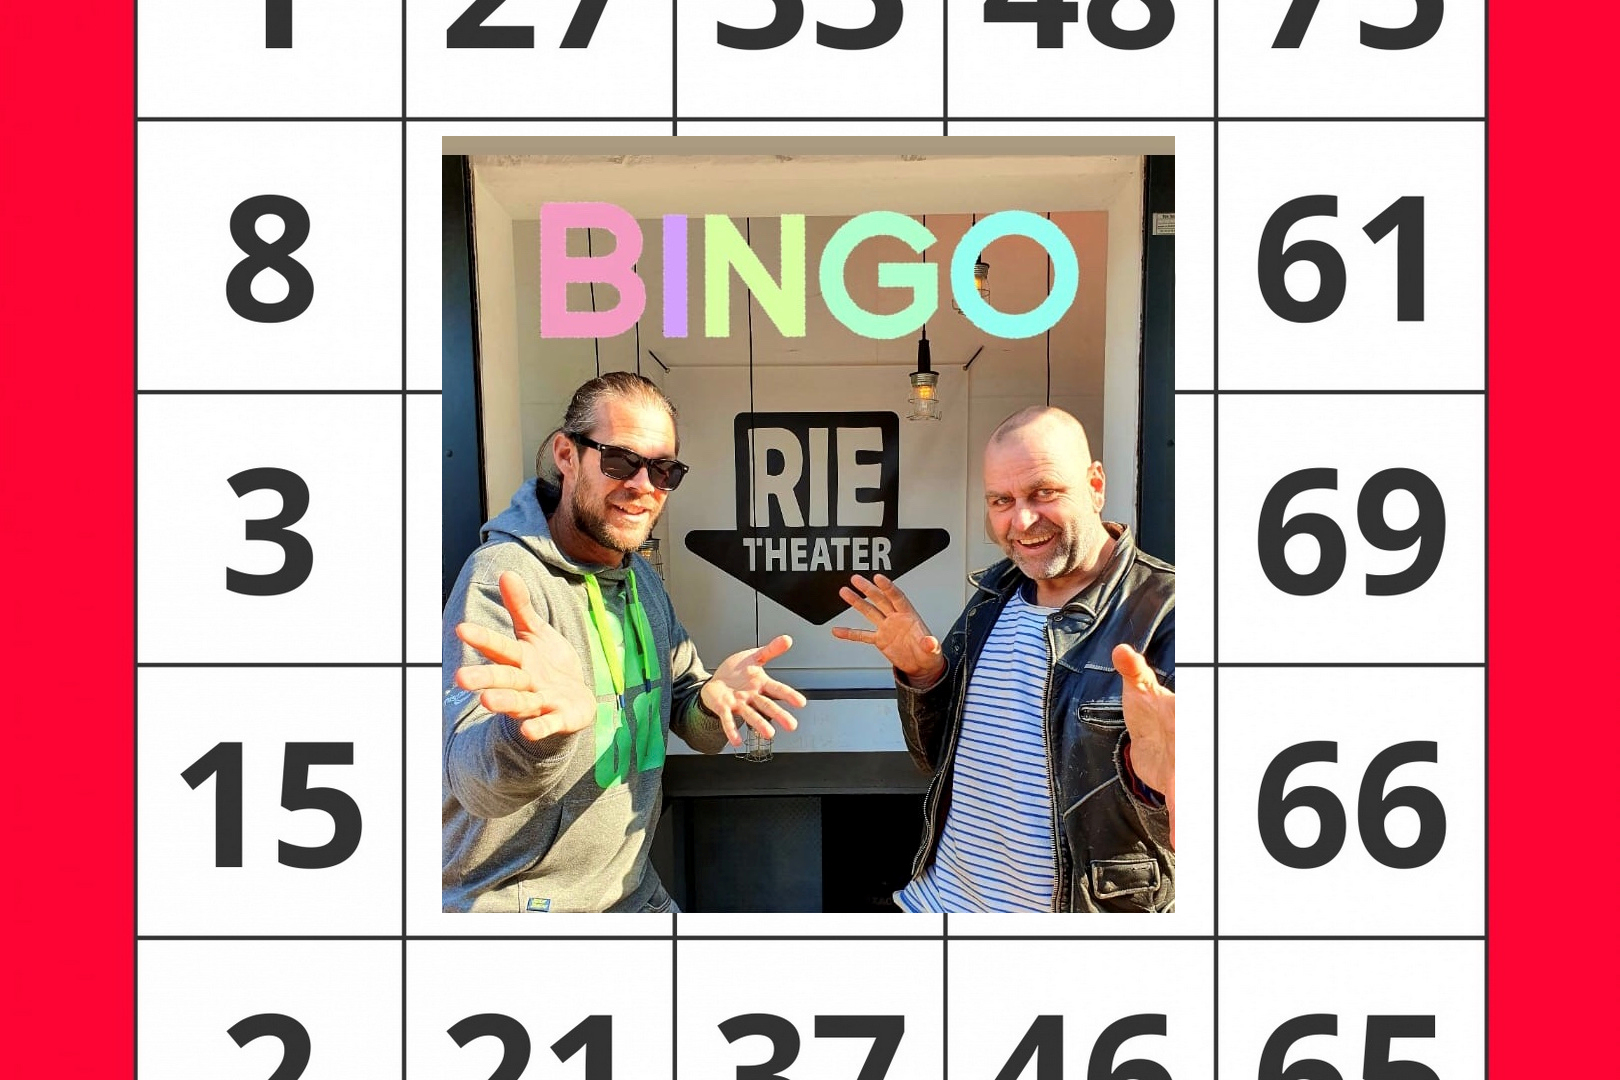 20200403 RIE Online Bingo-site